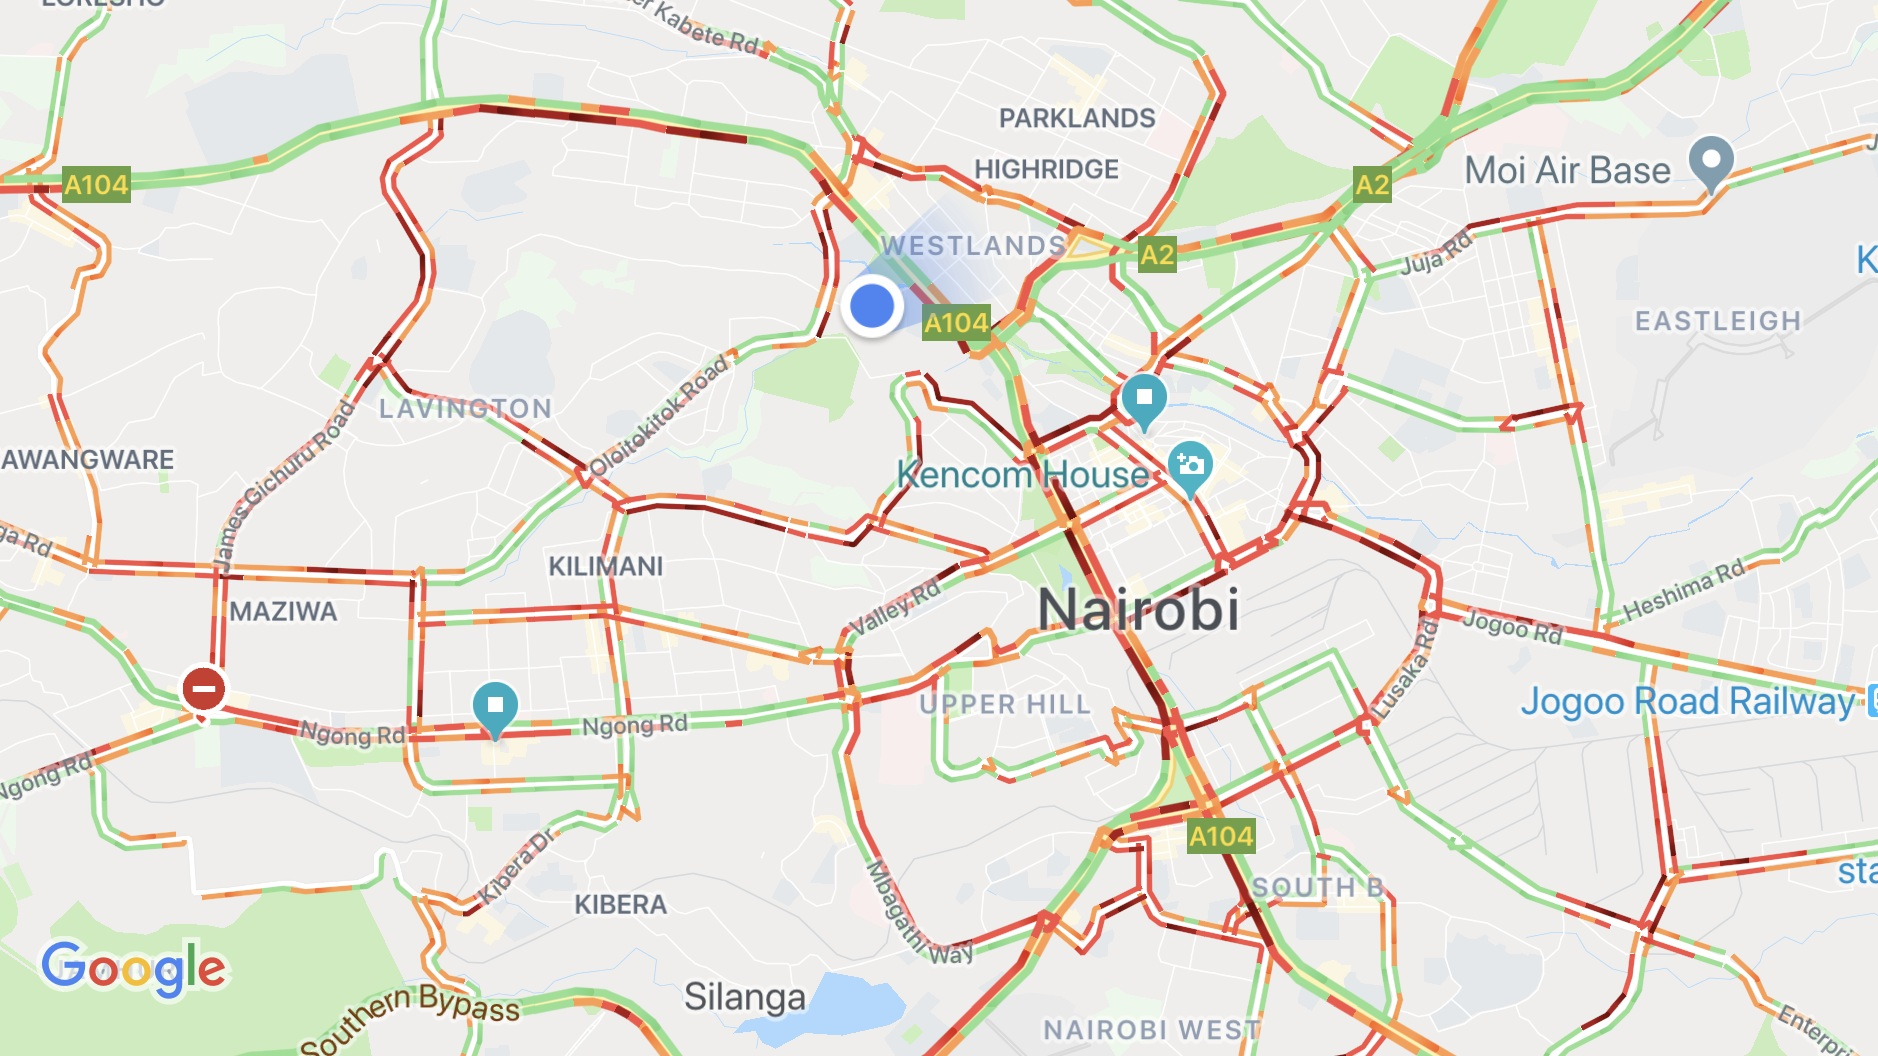 La circulation de Nairobi pendant les heures de pointe...